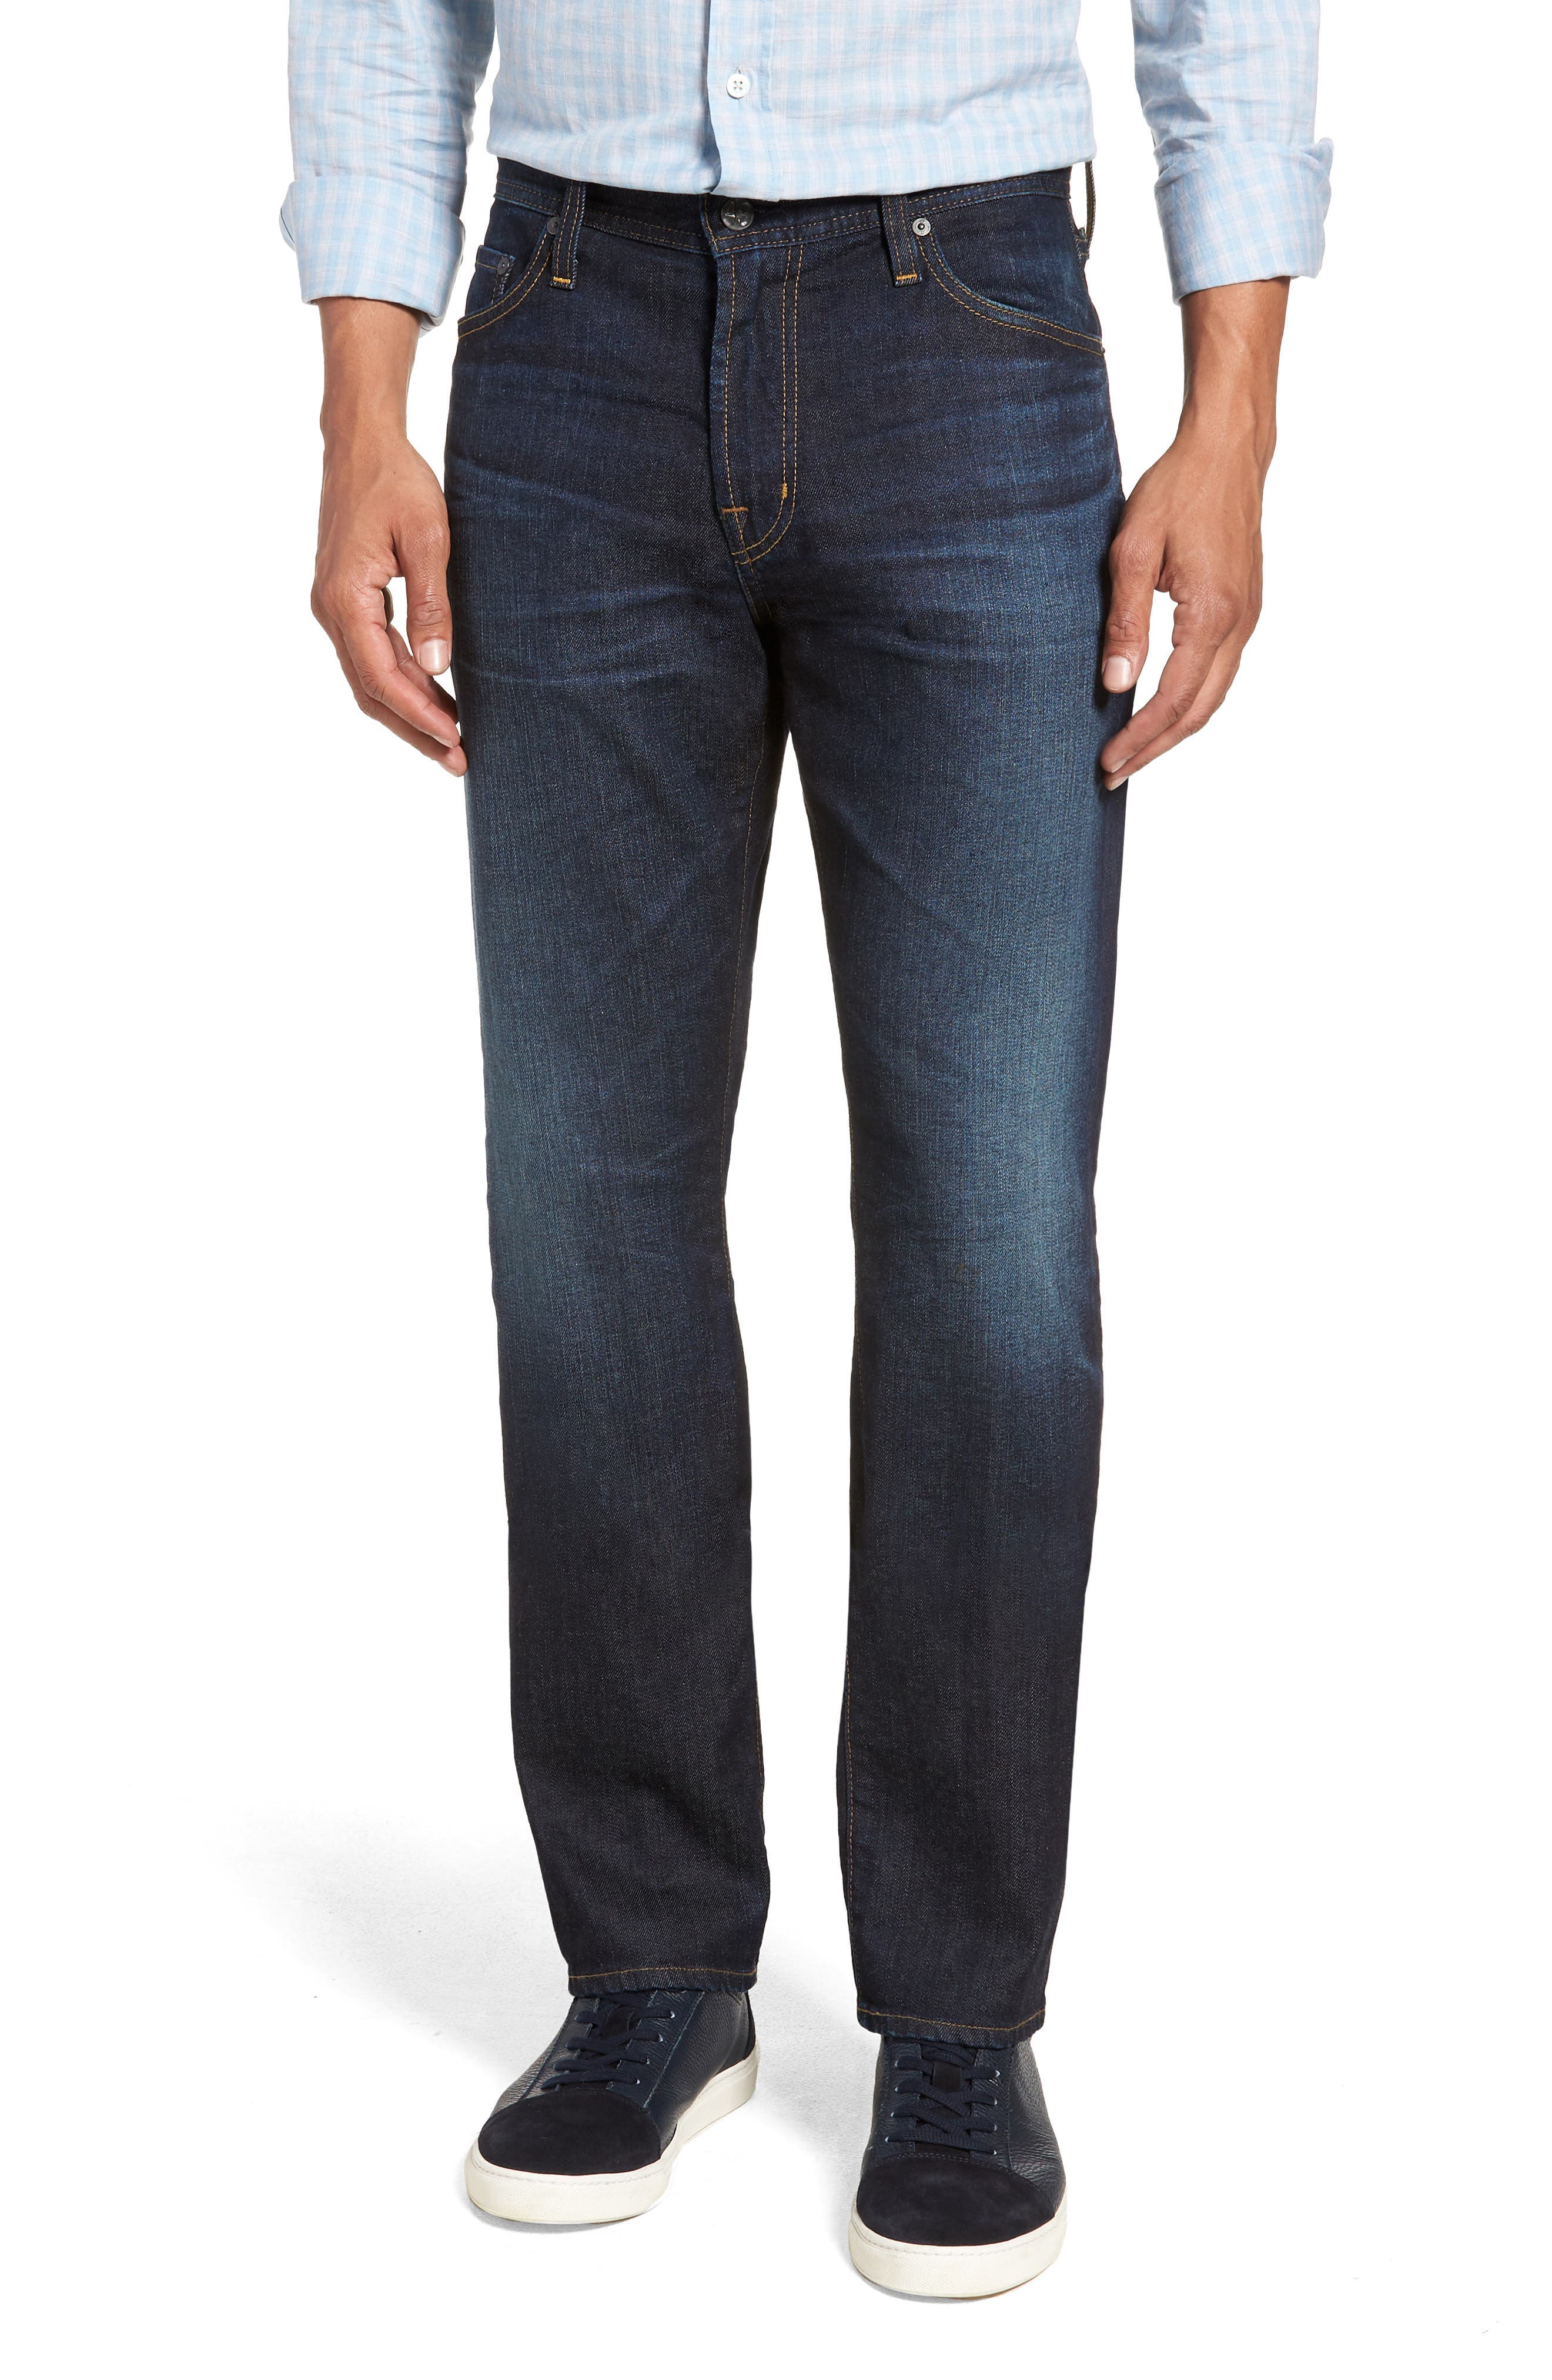 Everett Slim Straight Leg Jeans,                             Main thumbnail 1, color,                             5 YEARS CASINO